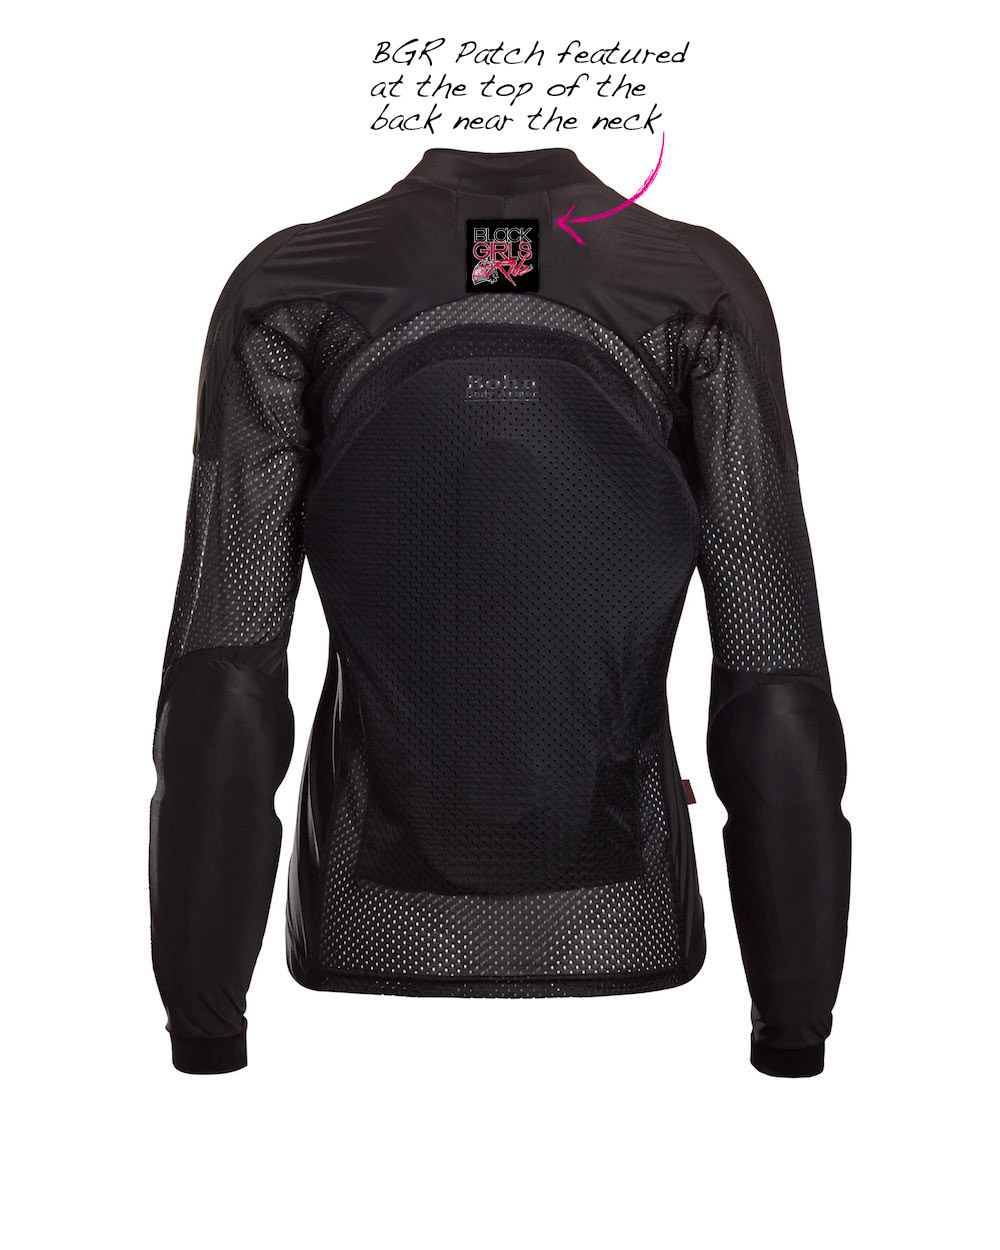 f9cd2a0d2e6 BGR + Bohn Armor All-Season Armored Riding Shirt – Black/Pink ...